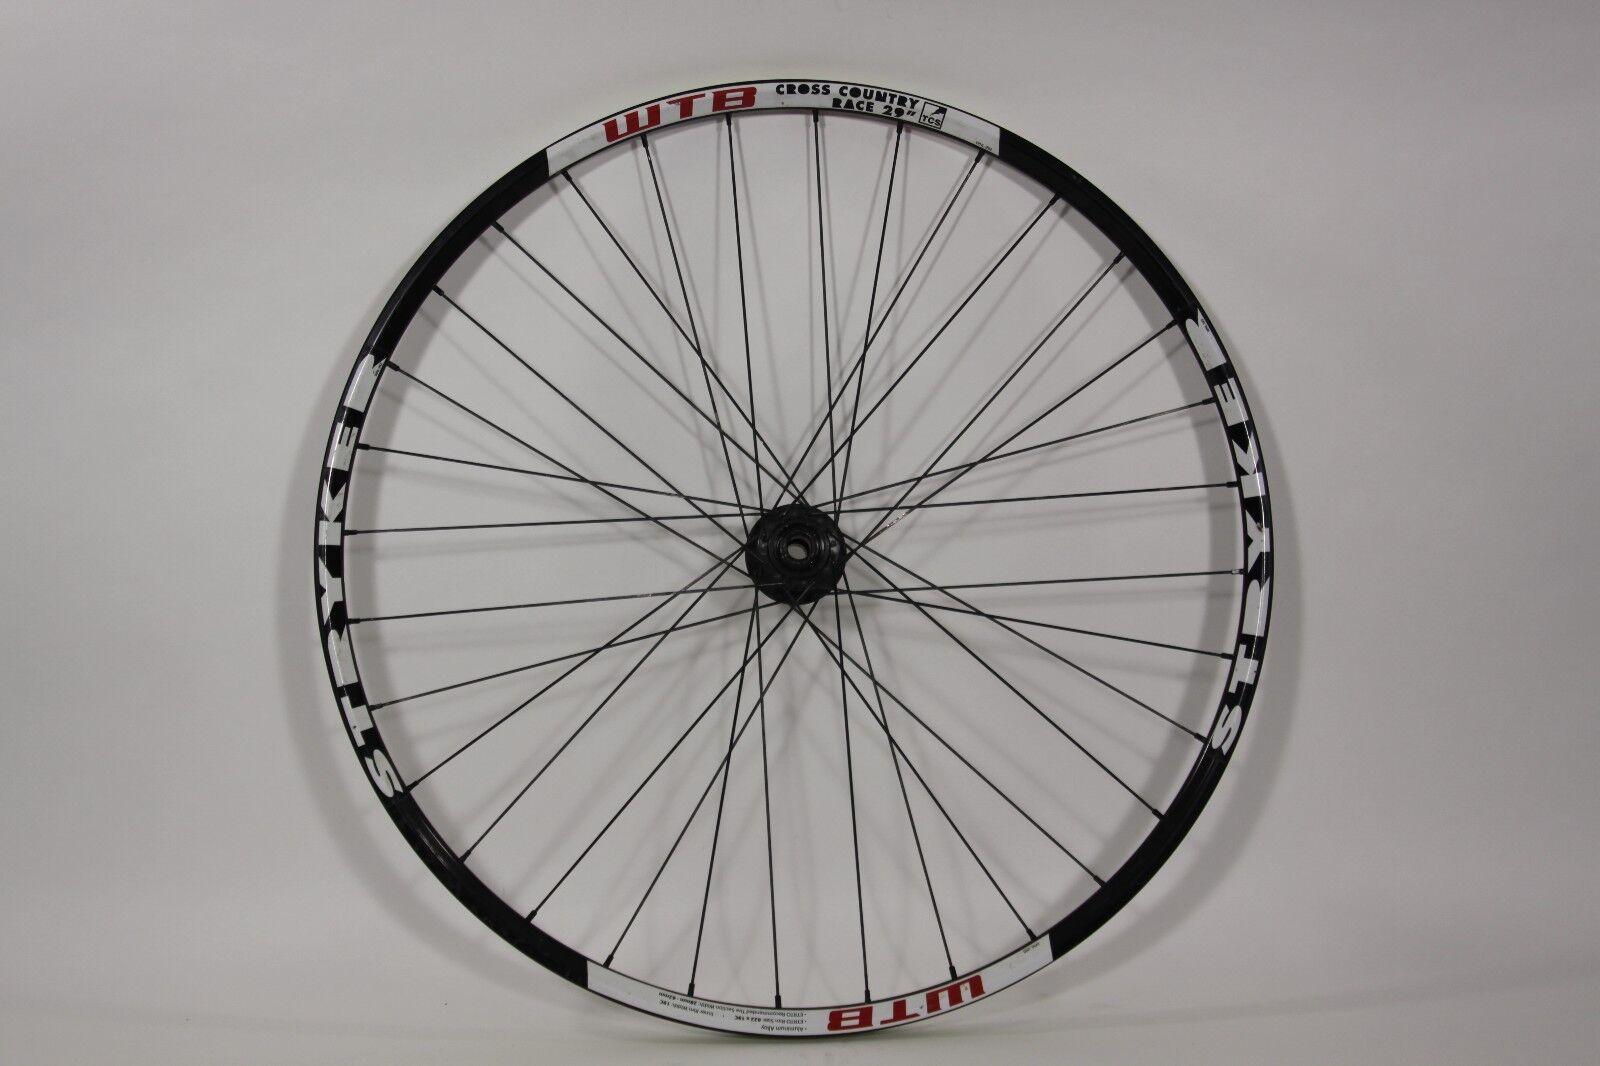 29er Rear Wheel WTB Stryker Cross Country Race 135 x 10mm QR TCS 6 bolt 32h R18